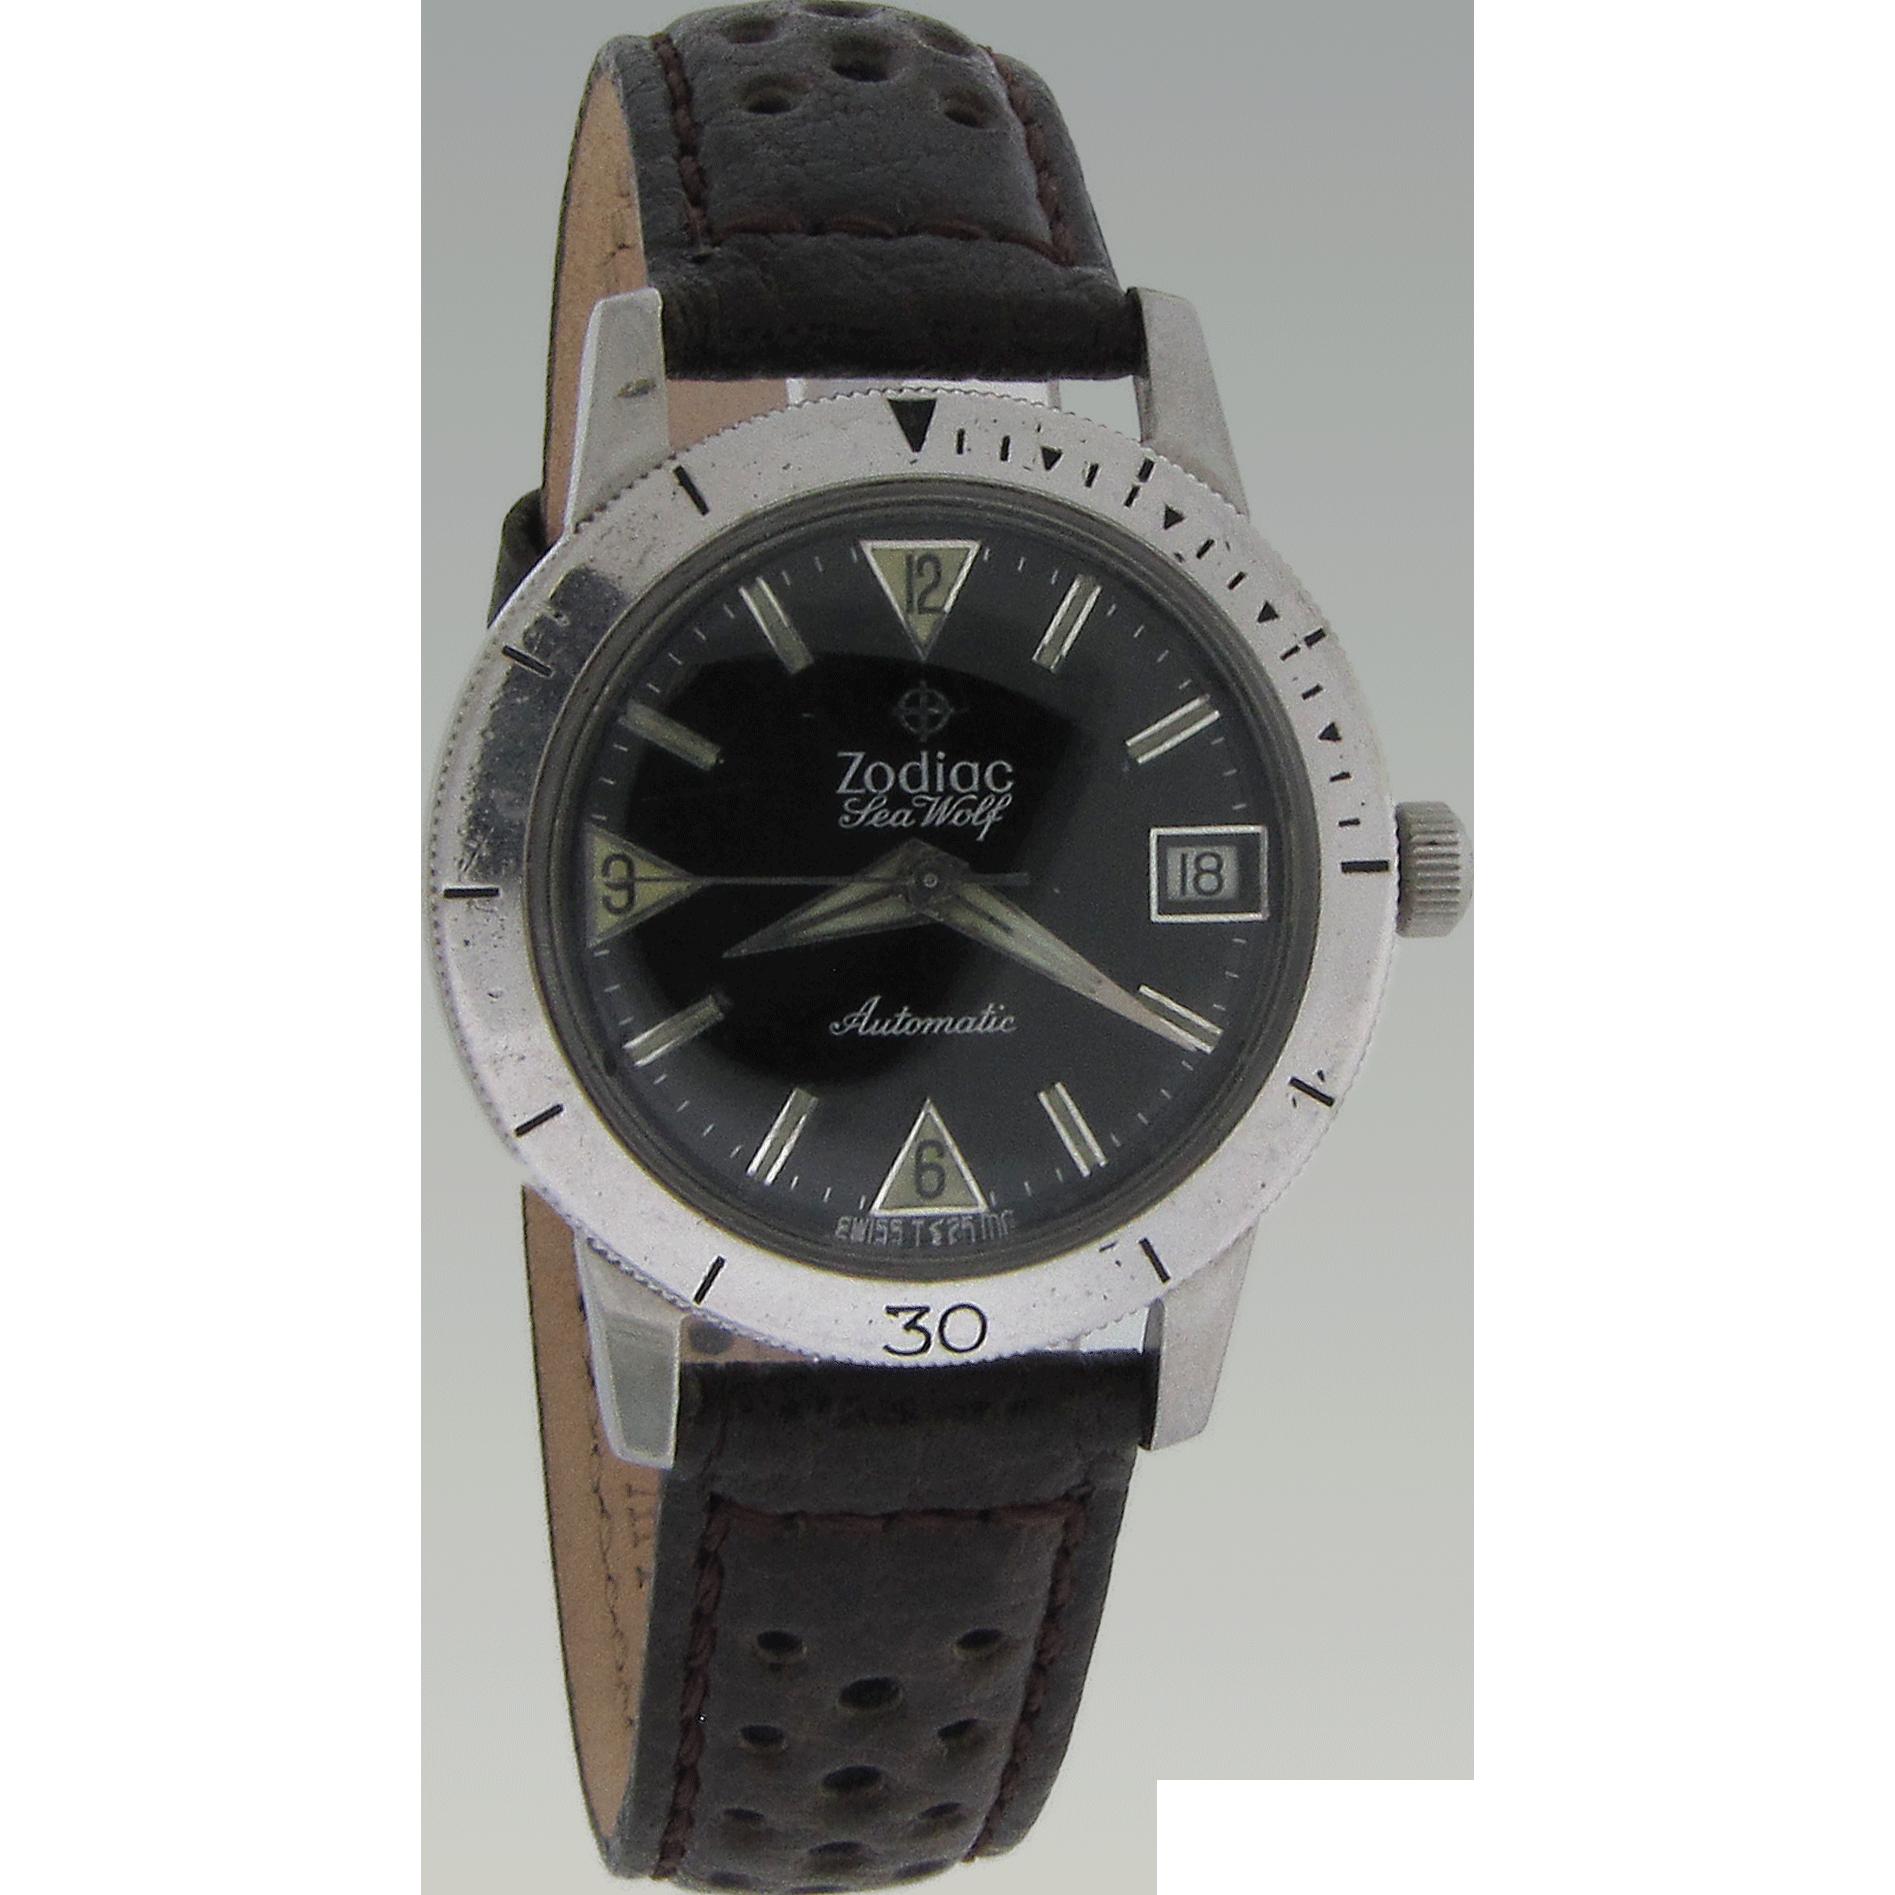 Mens Zodiak Seawolf Model Wrist Watch